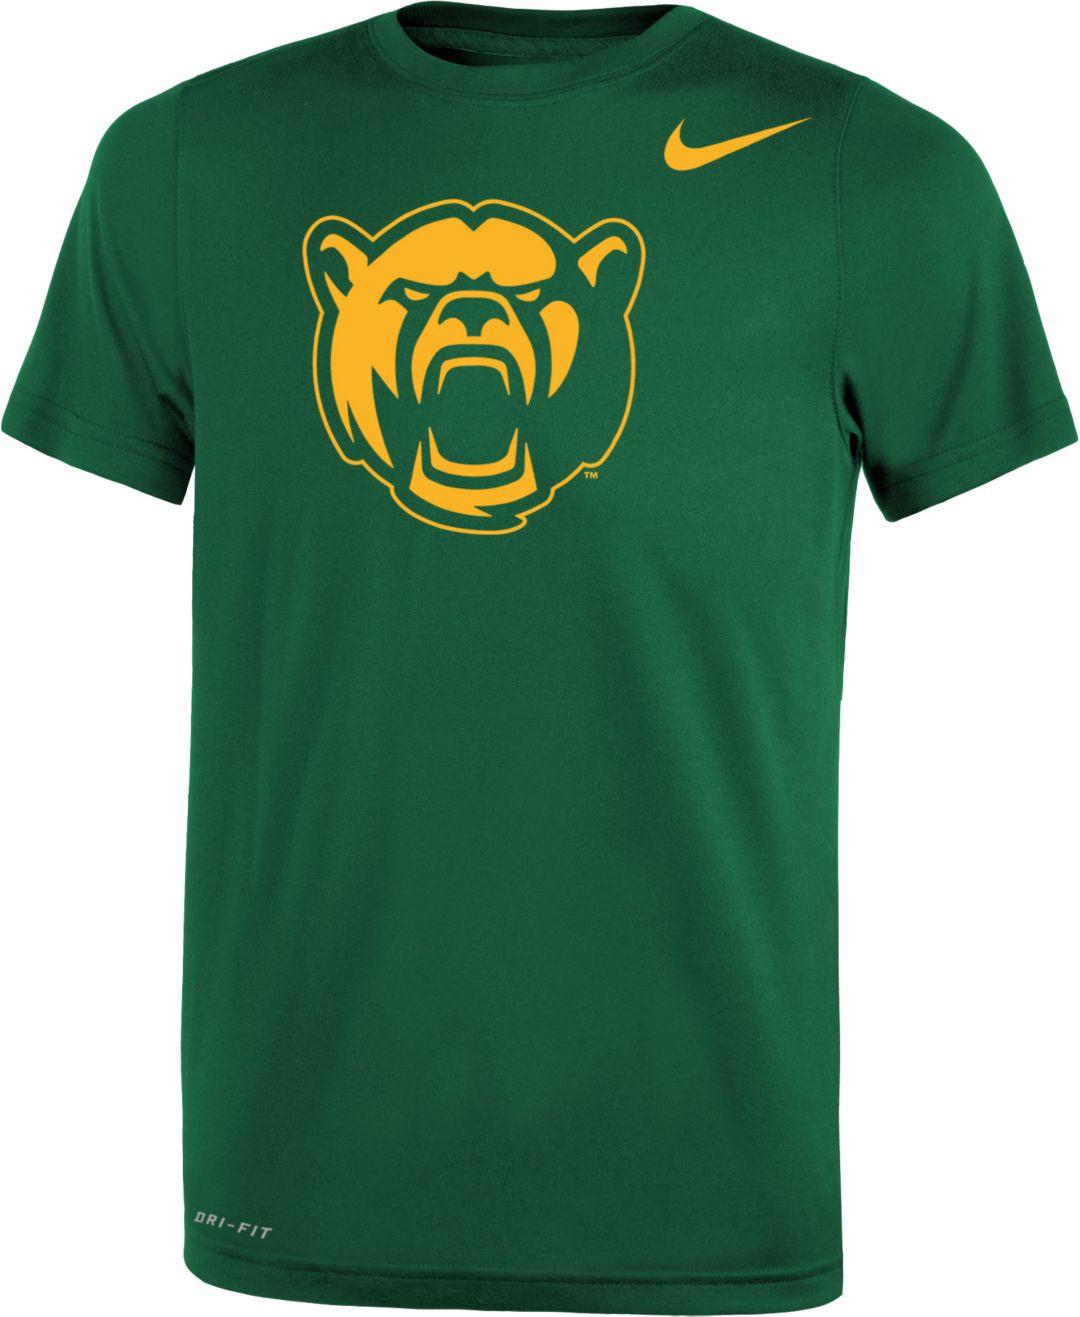 ca087fa8 Nike Youth Baylor Bears Green Logo Dri-FIT Legend 2.0 T-Shirt ...